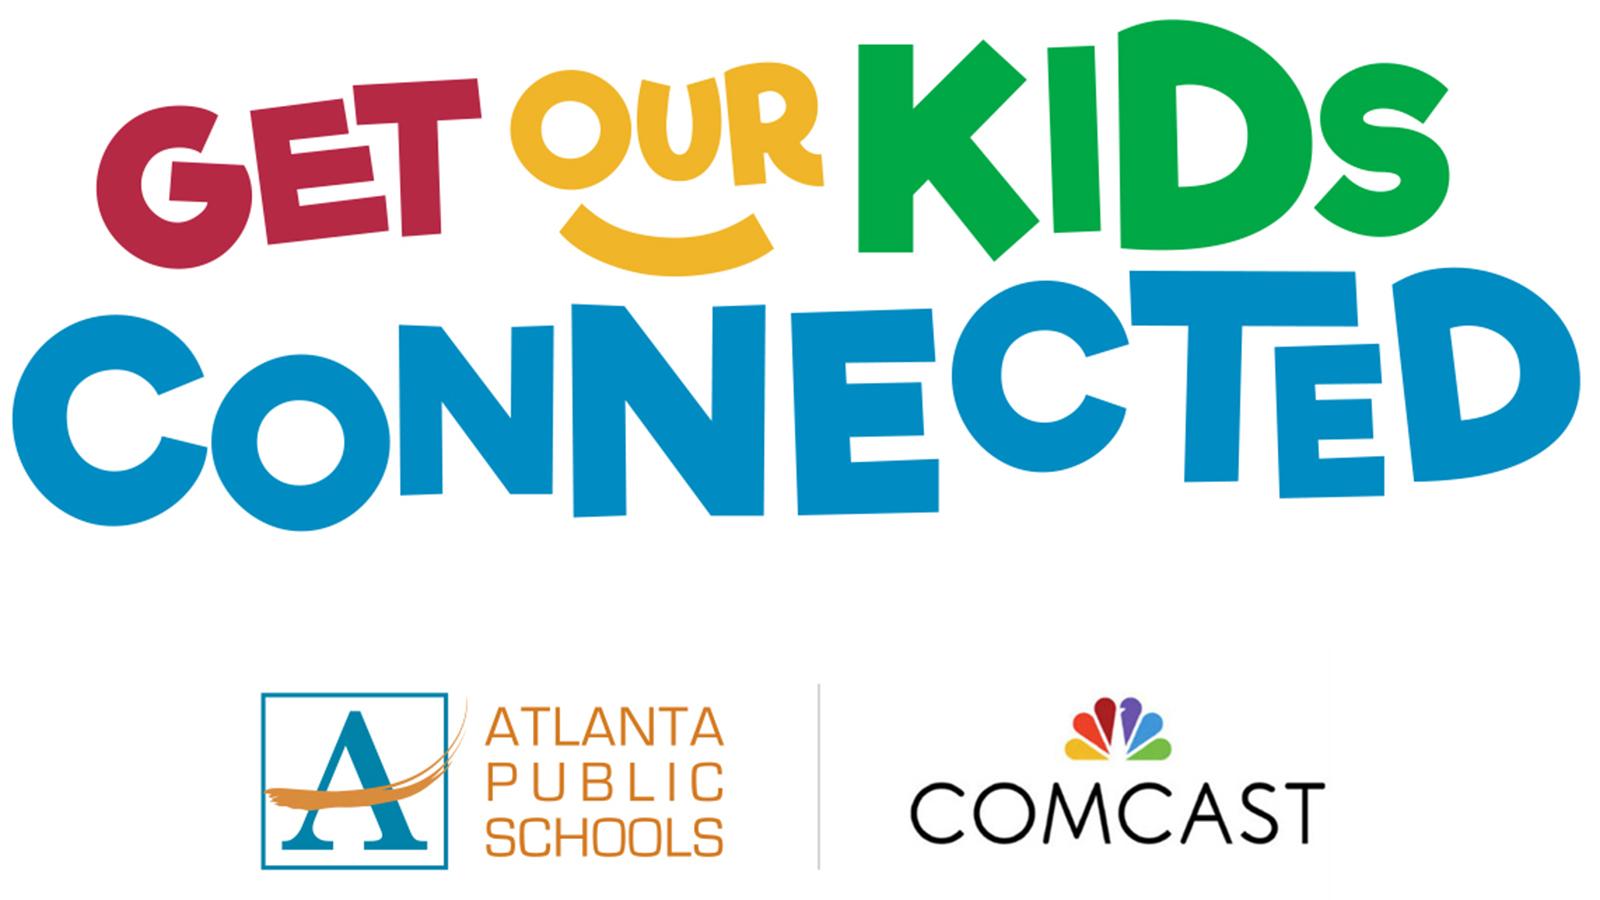 Get Our Kids Connected Logo - Atlanta Public Schools